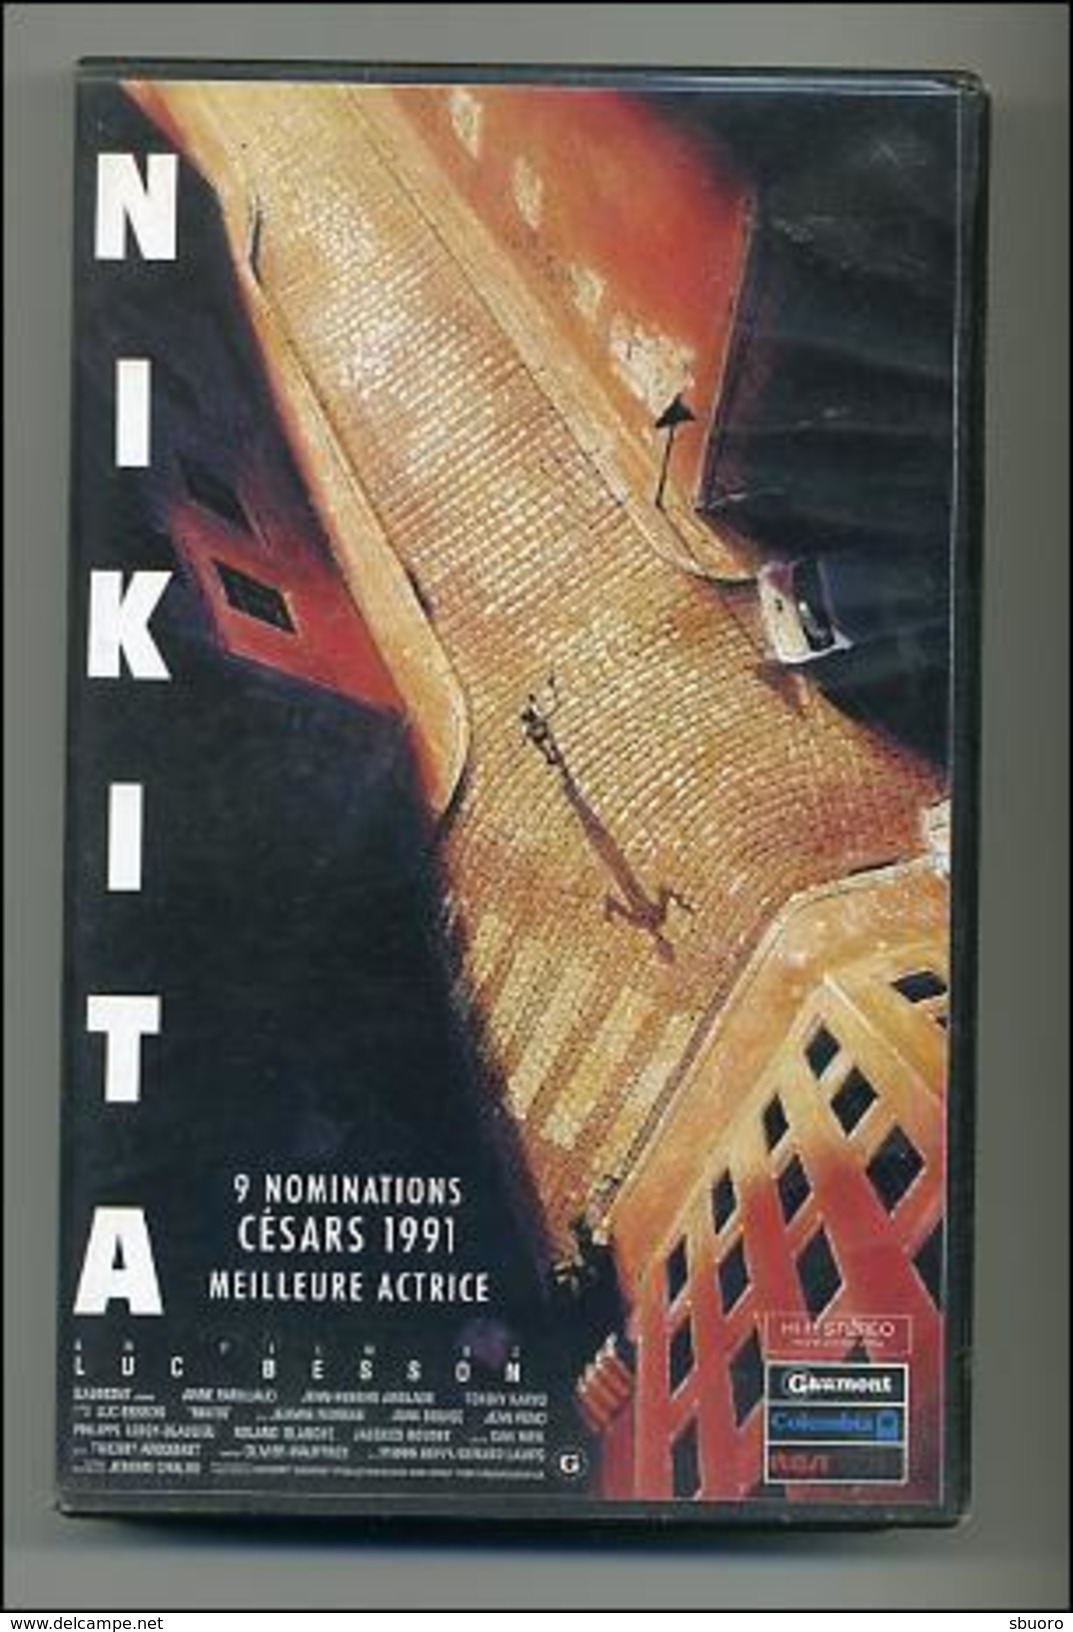 VHS Nikita - Luc Besson - Action, Aventure